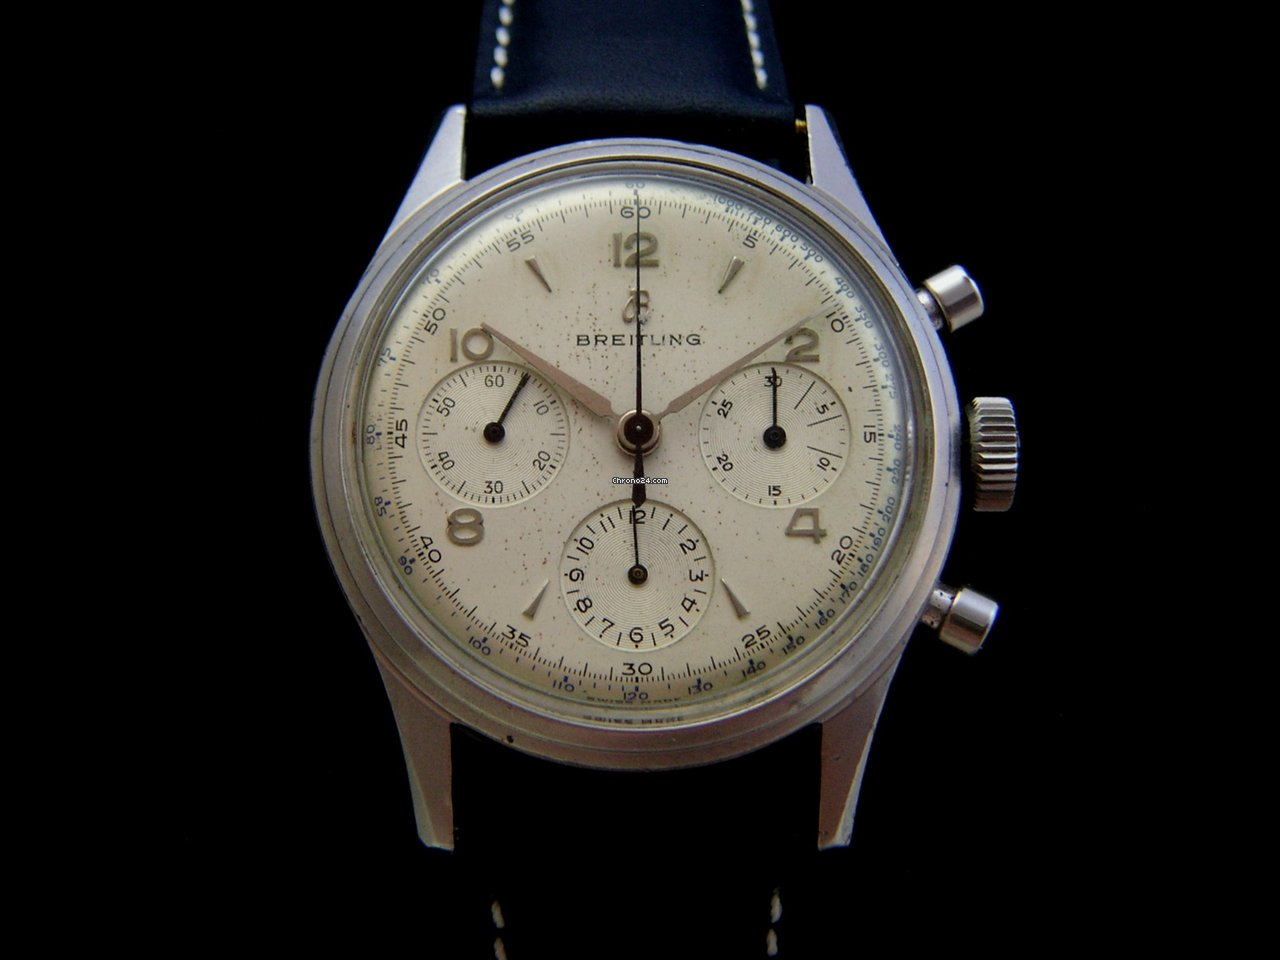 breitling vintage chronograph 50 39 s 178 caliber ref 765 verkauft auf chrono24. Black Bedroom Furniture Sets. Home Design Ideas